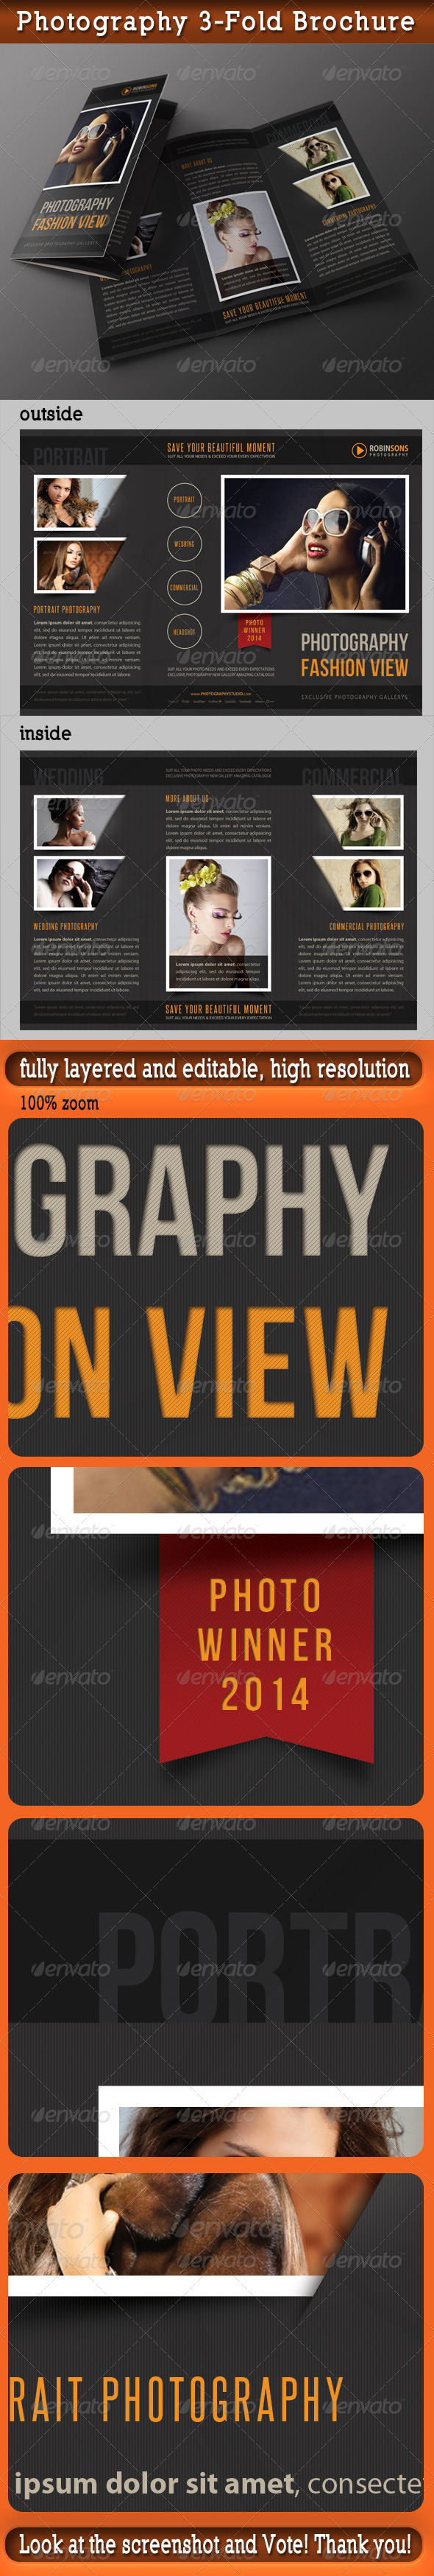 Photography Portfolio 3-Fold Brochure 04 - Portfolio Brochures